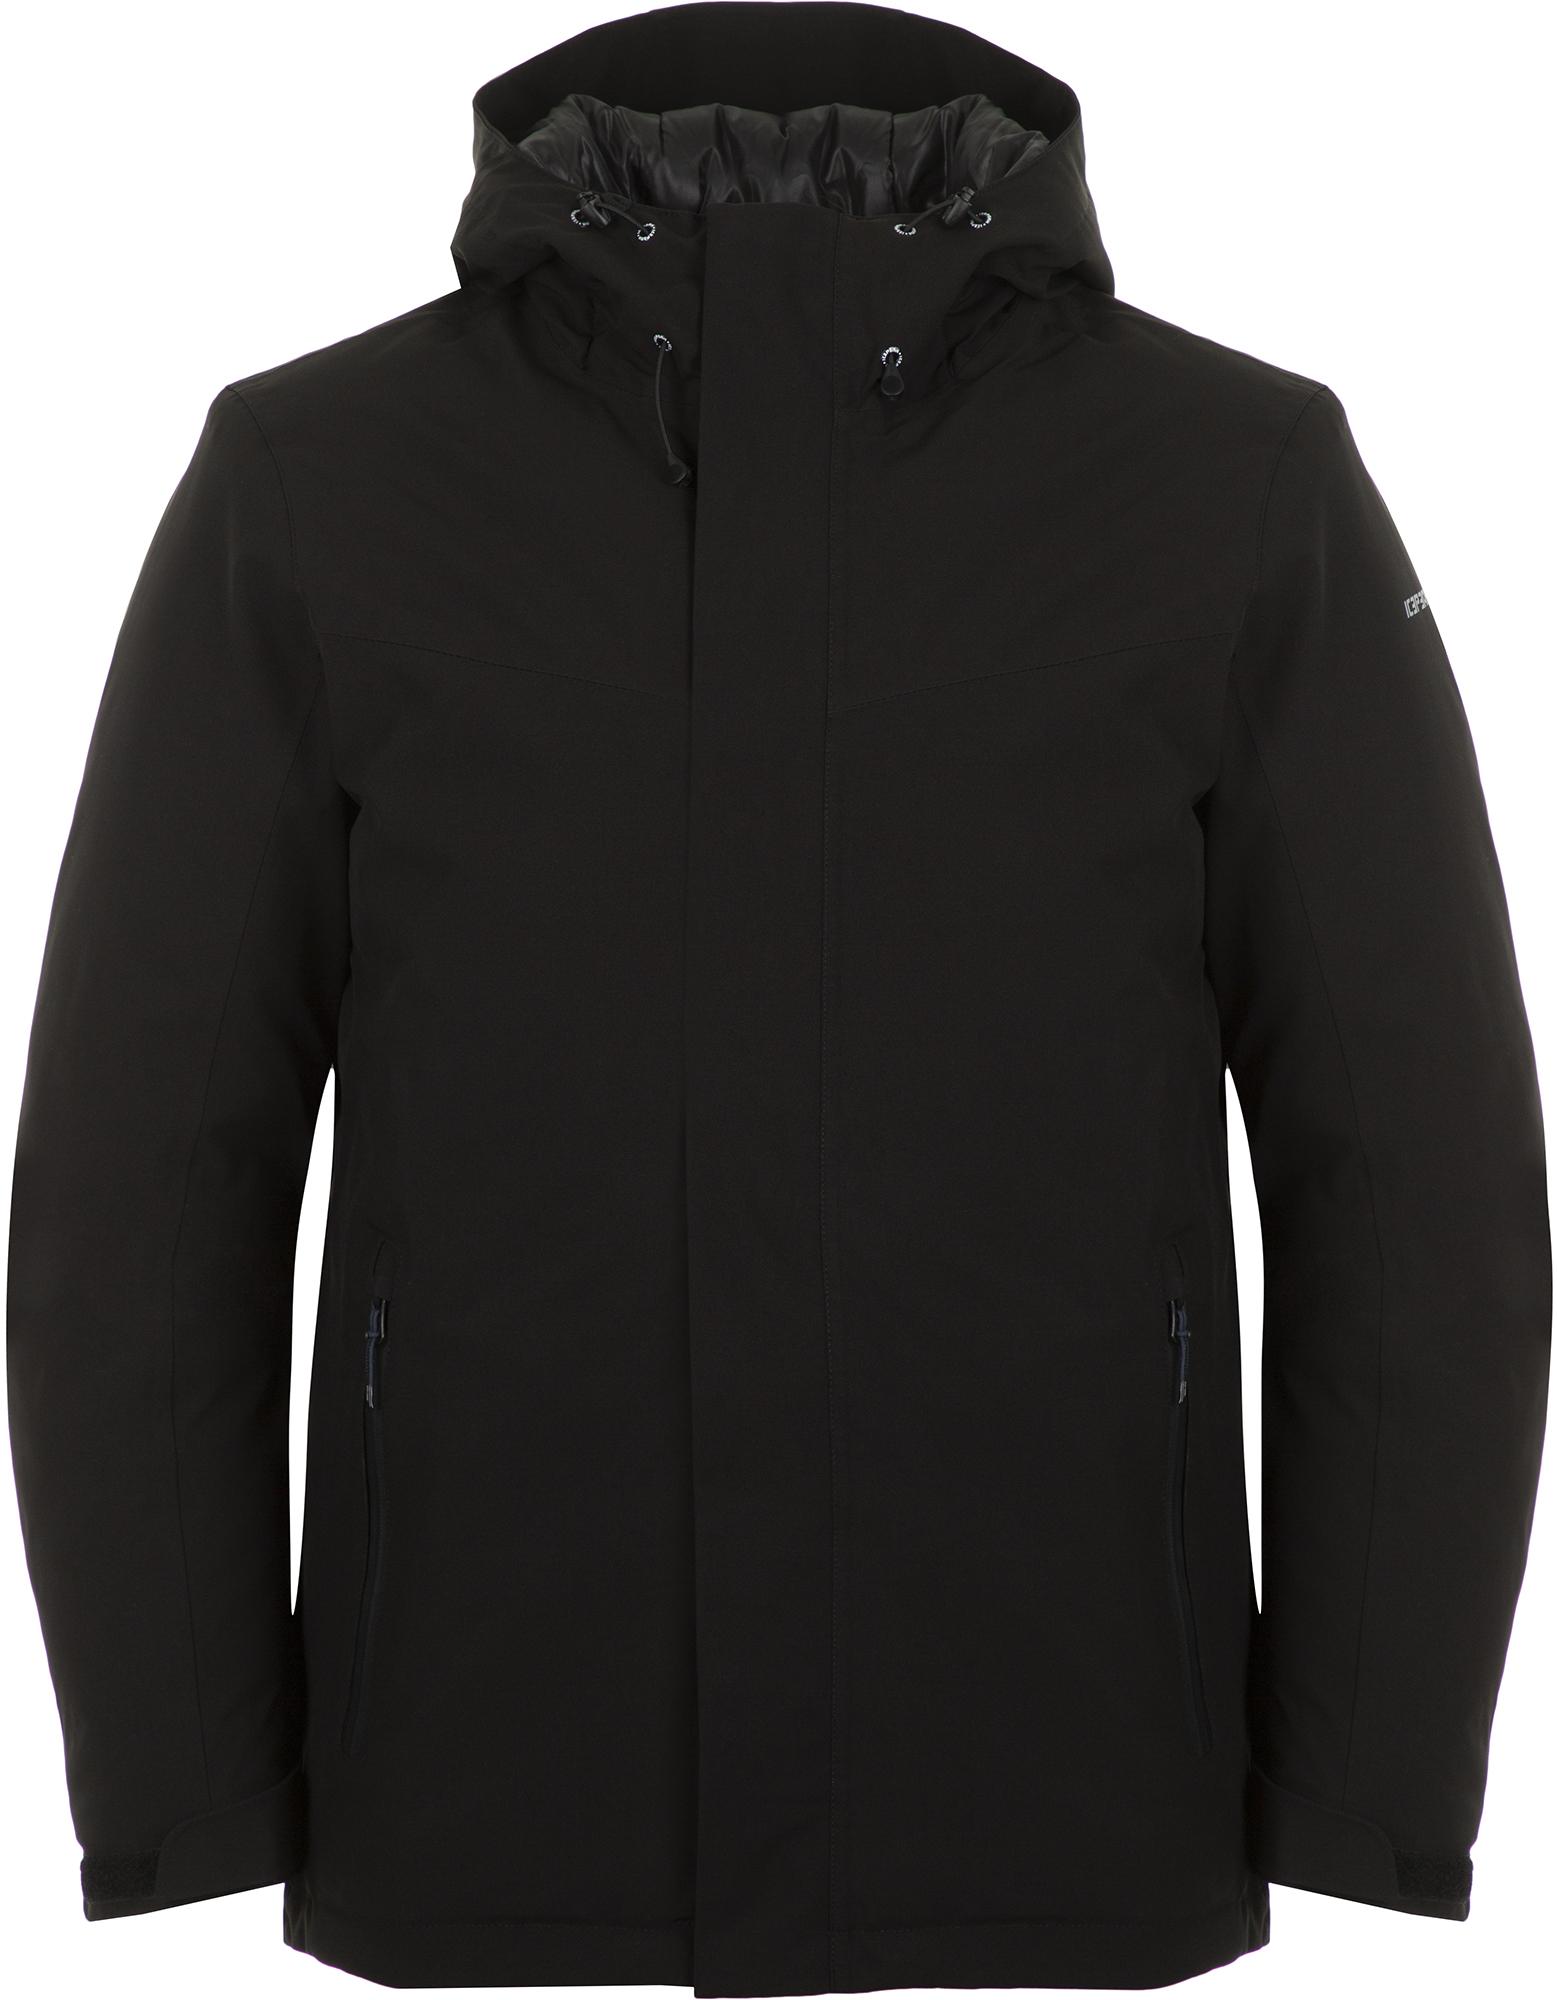 IcePeak Куртка утепленная мужская IcePeak Pinesdale, размер 52